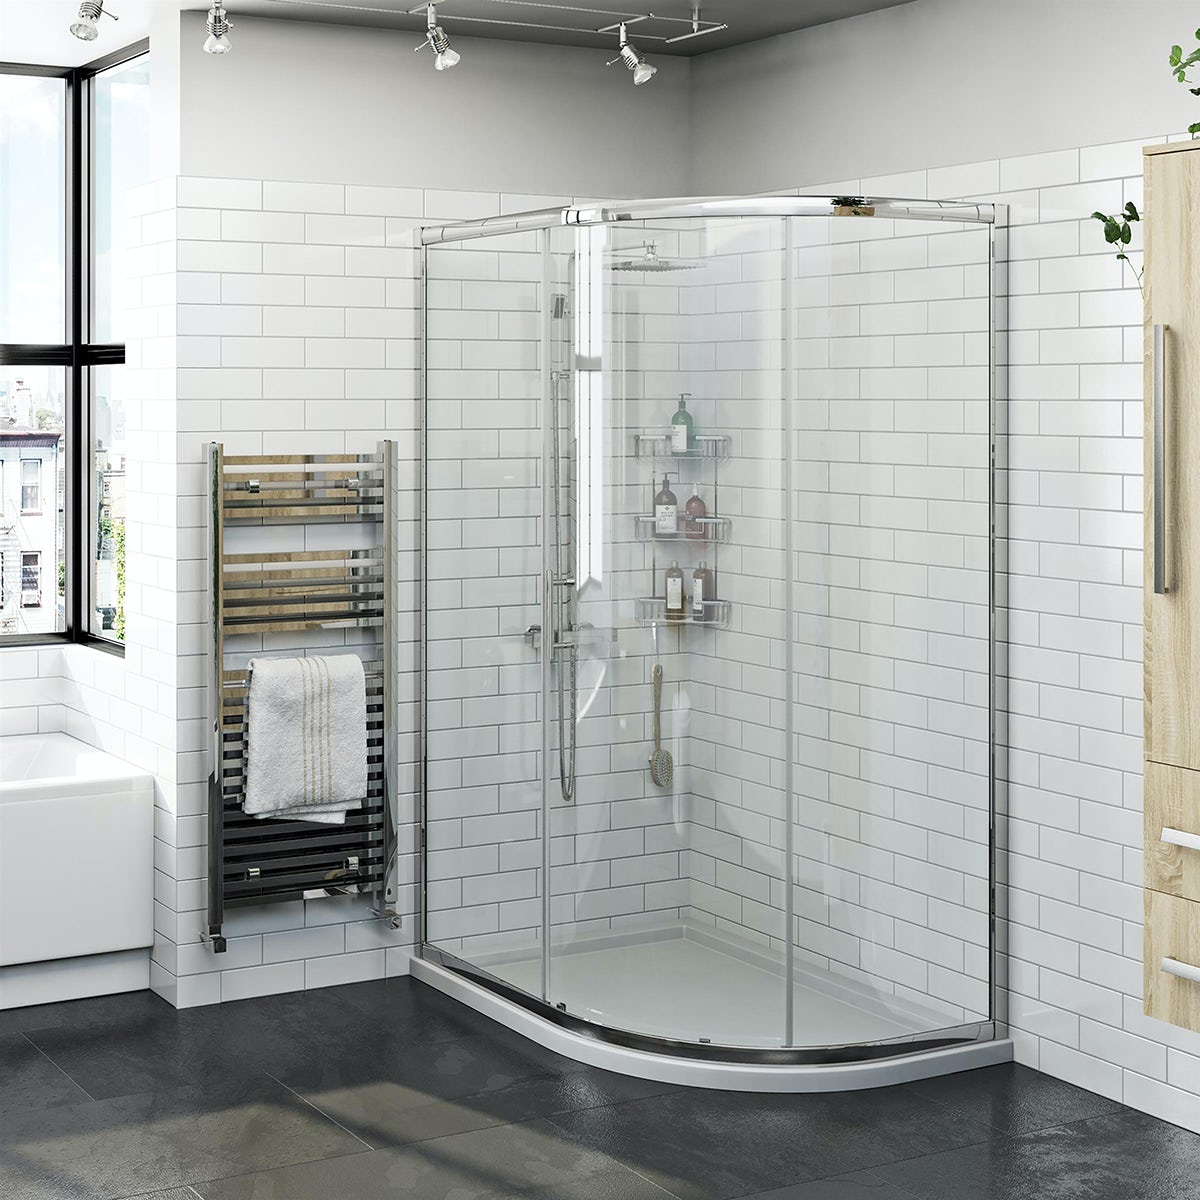 Orchard 6mm one door offset quadrant shower enclosure